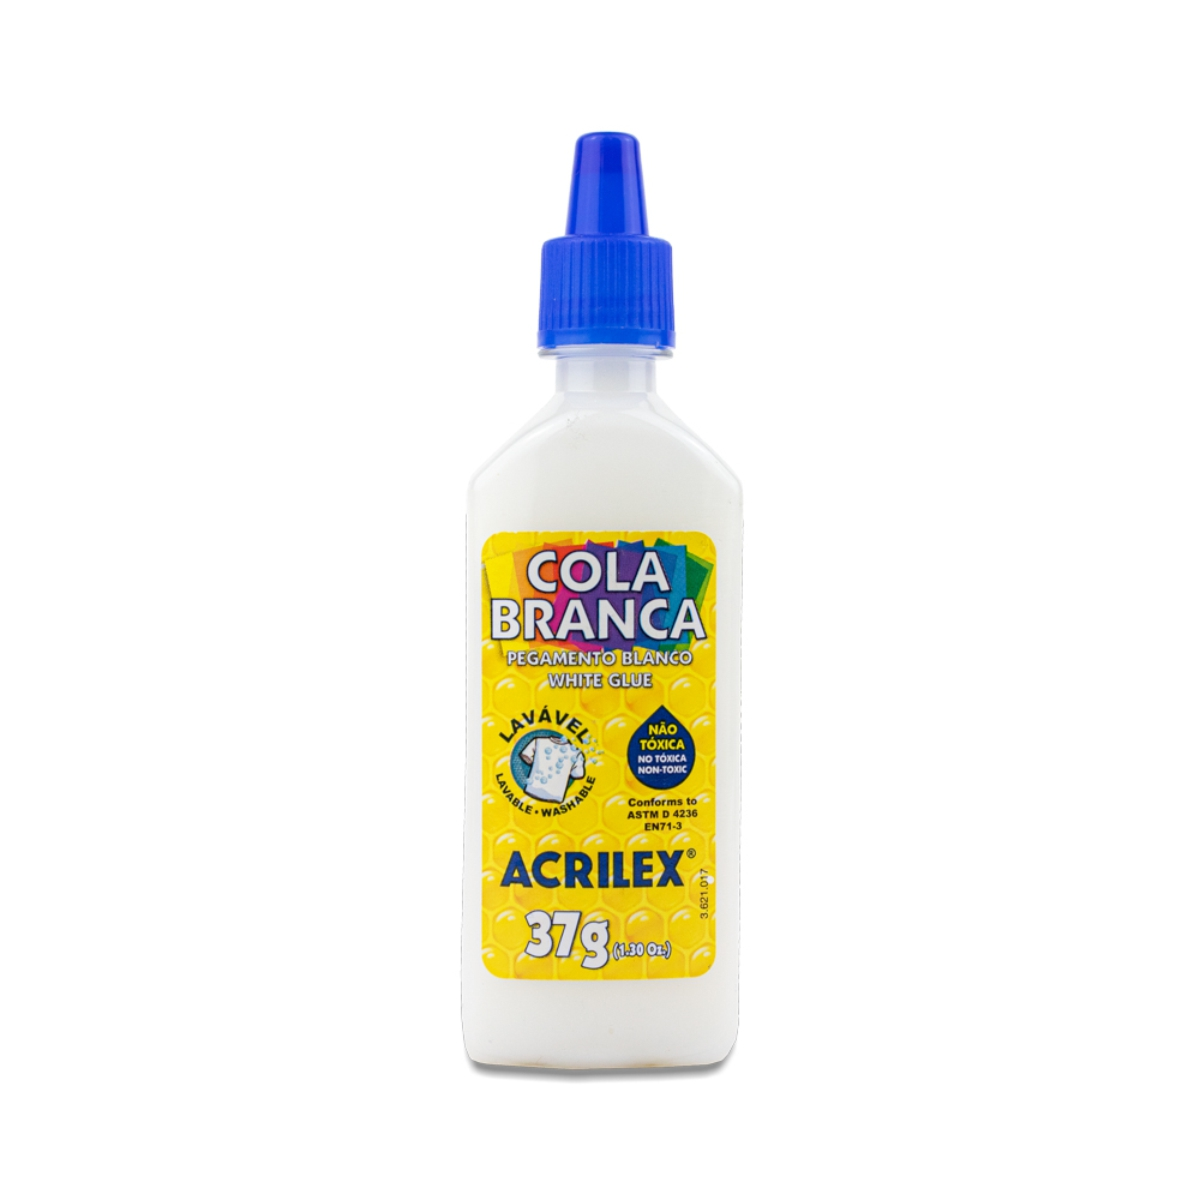 Cola Branca Acrilex Escolar Lavável 37g